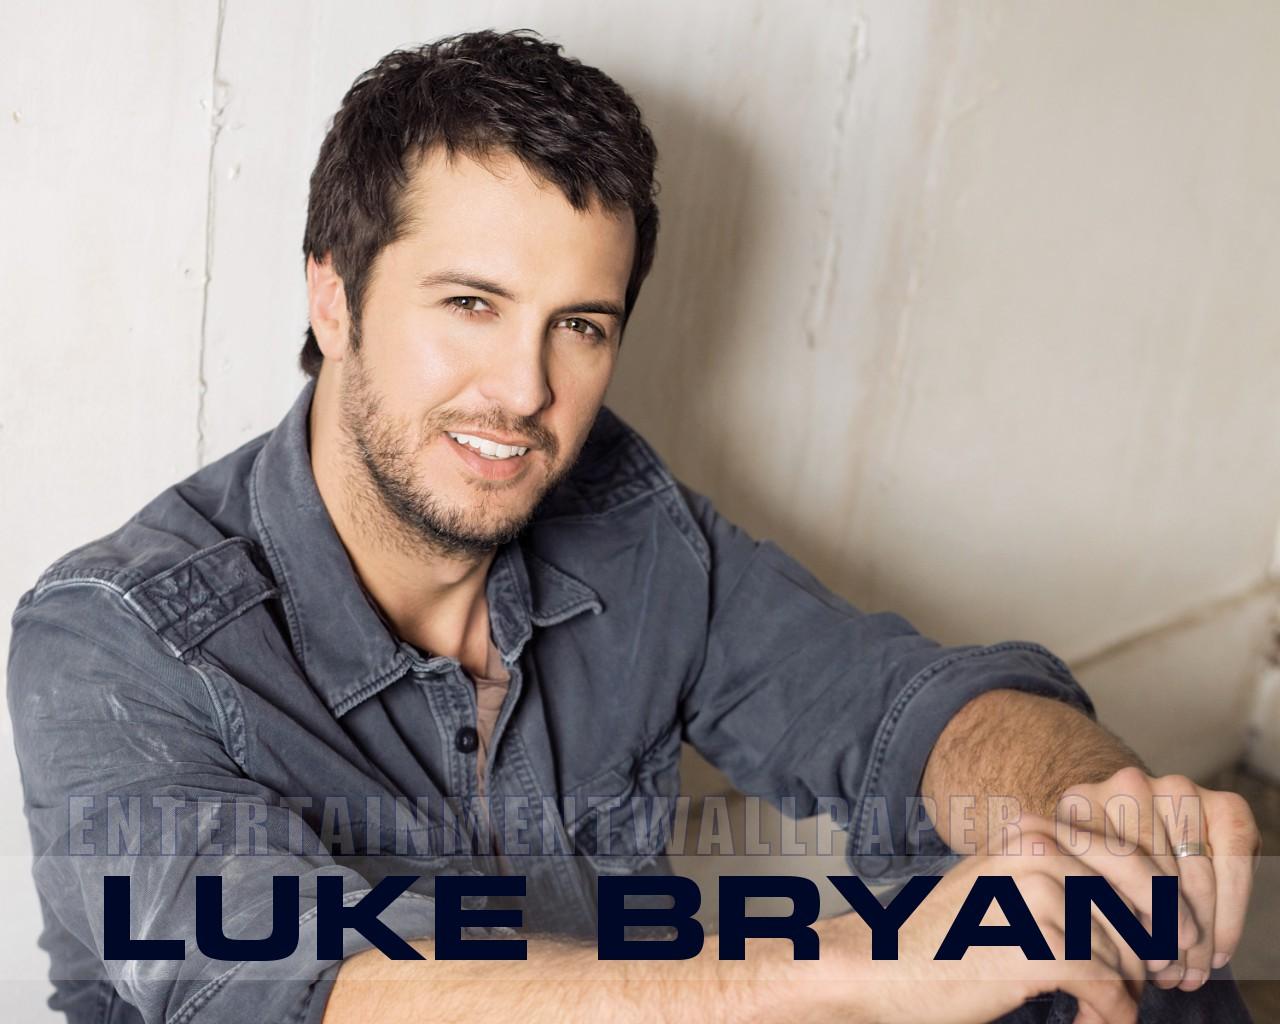 Luke Bryan Wallpaper